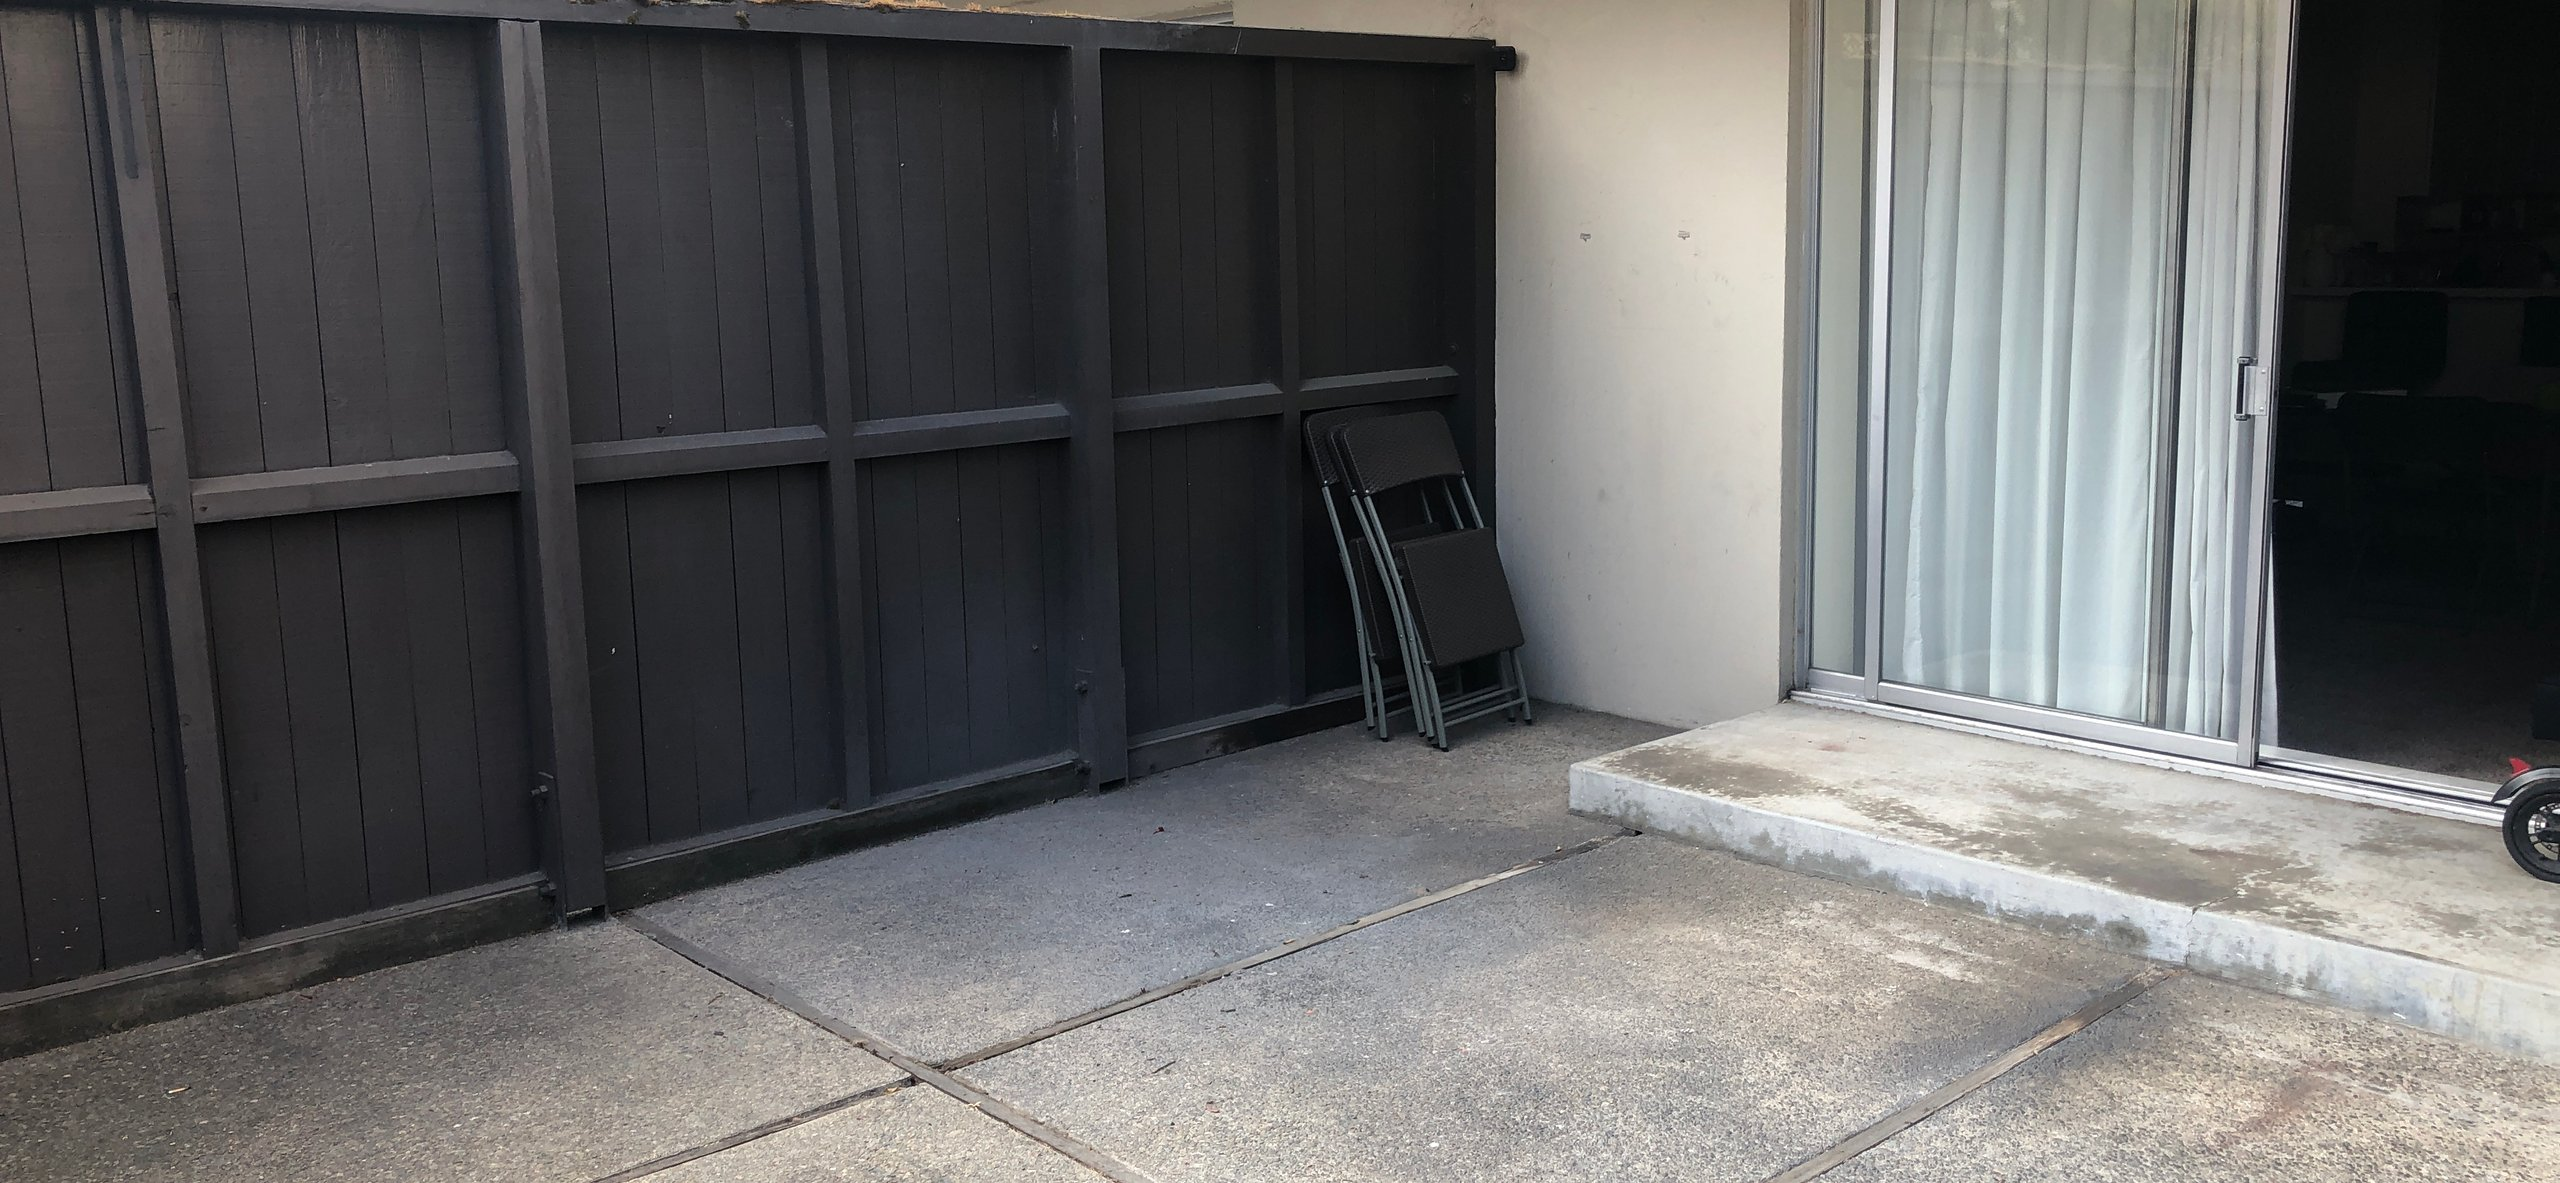 19x16 Unpaved Lot self storage unit